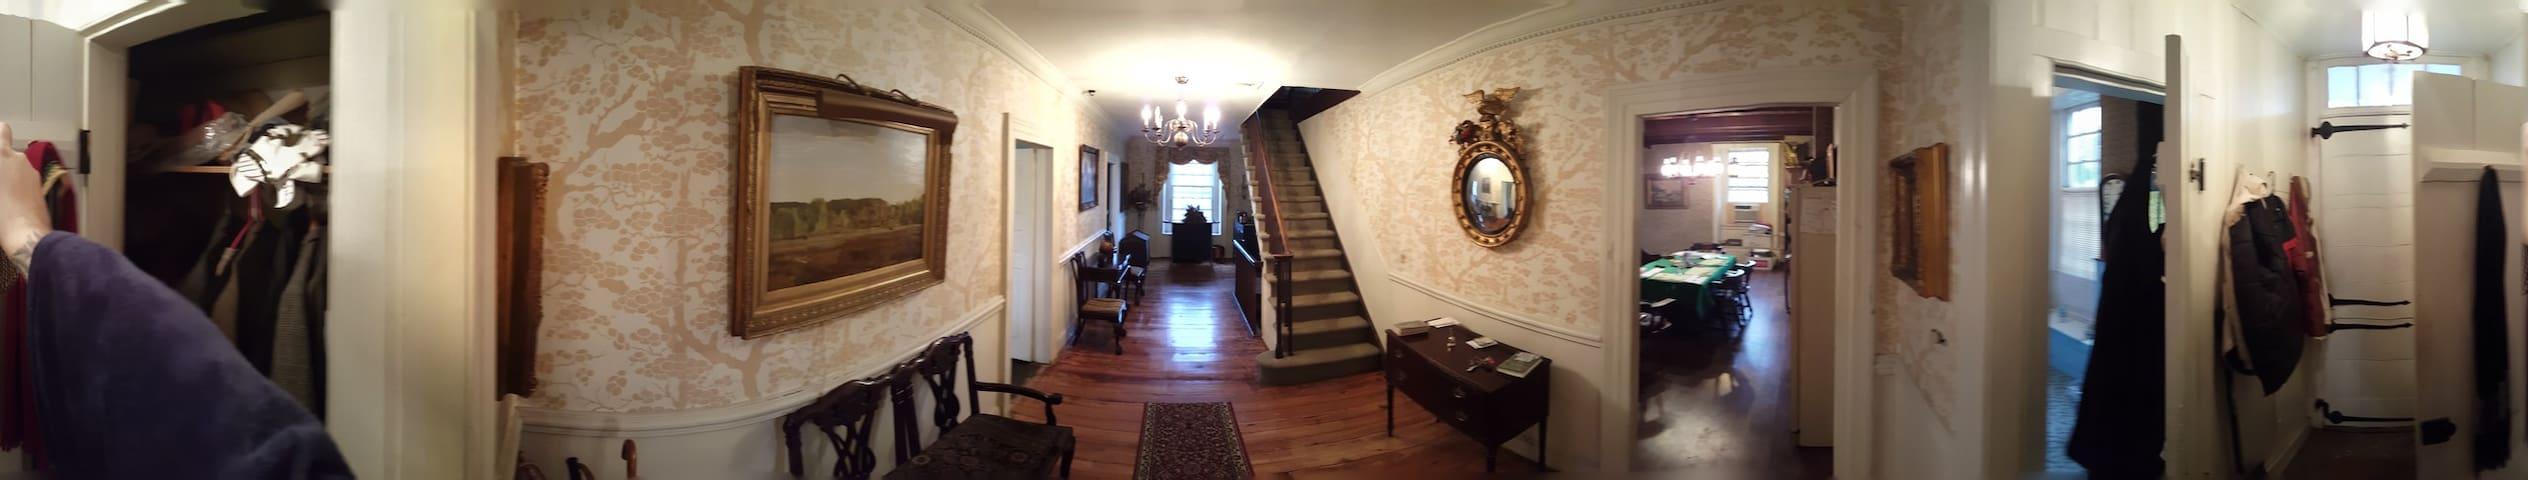 Historic Zabriskie Kipp Cadmus House - Teaneck - Andet